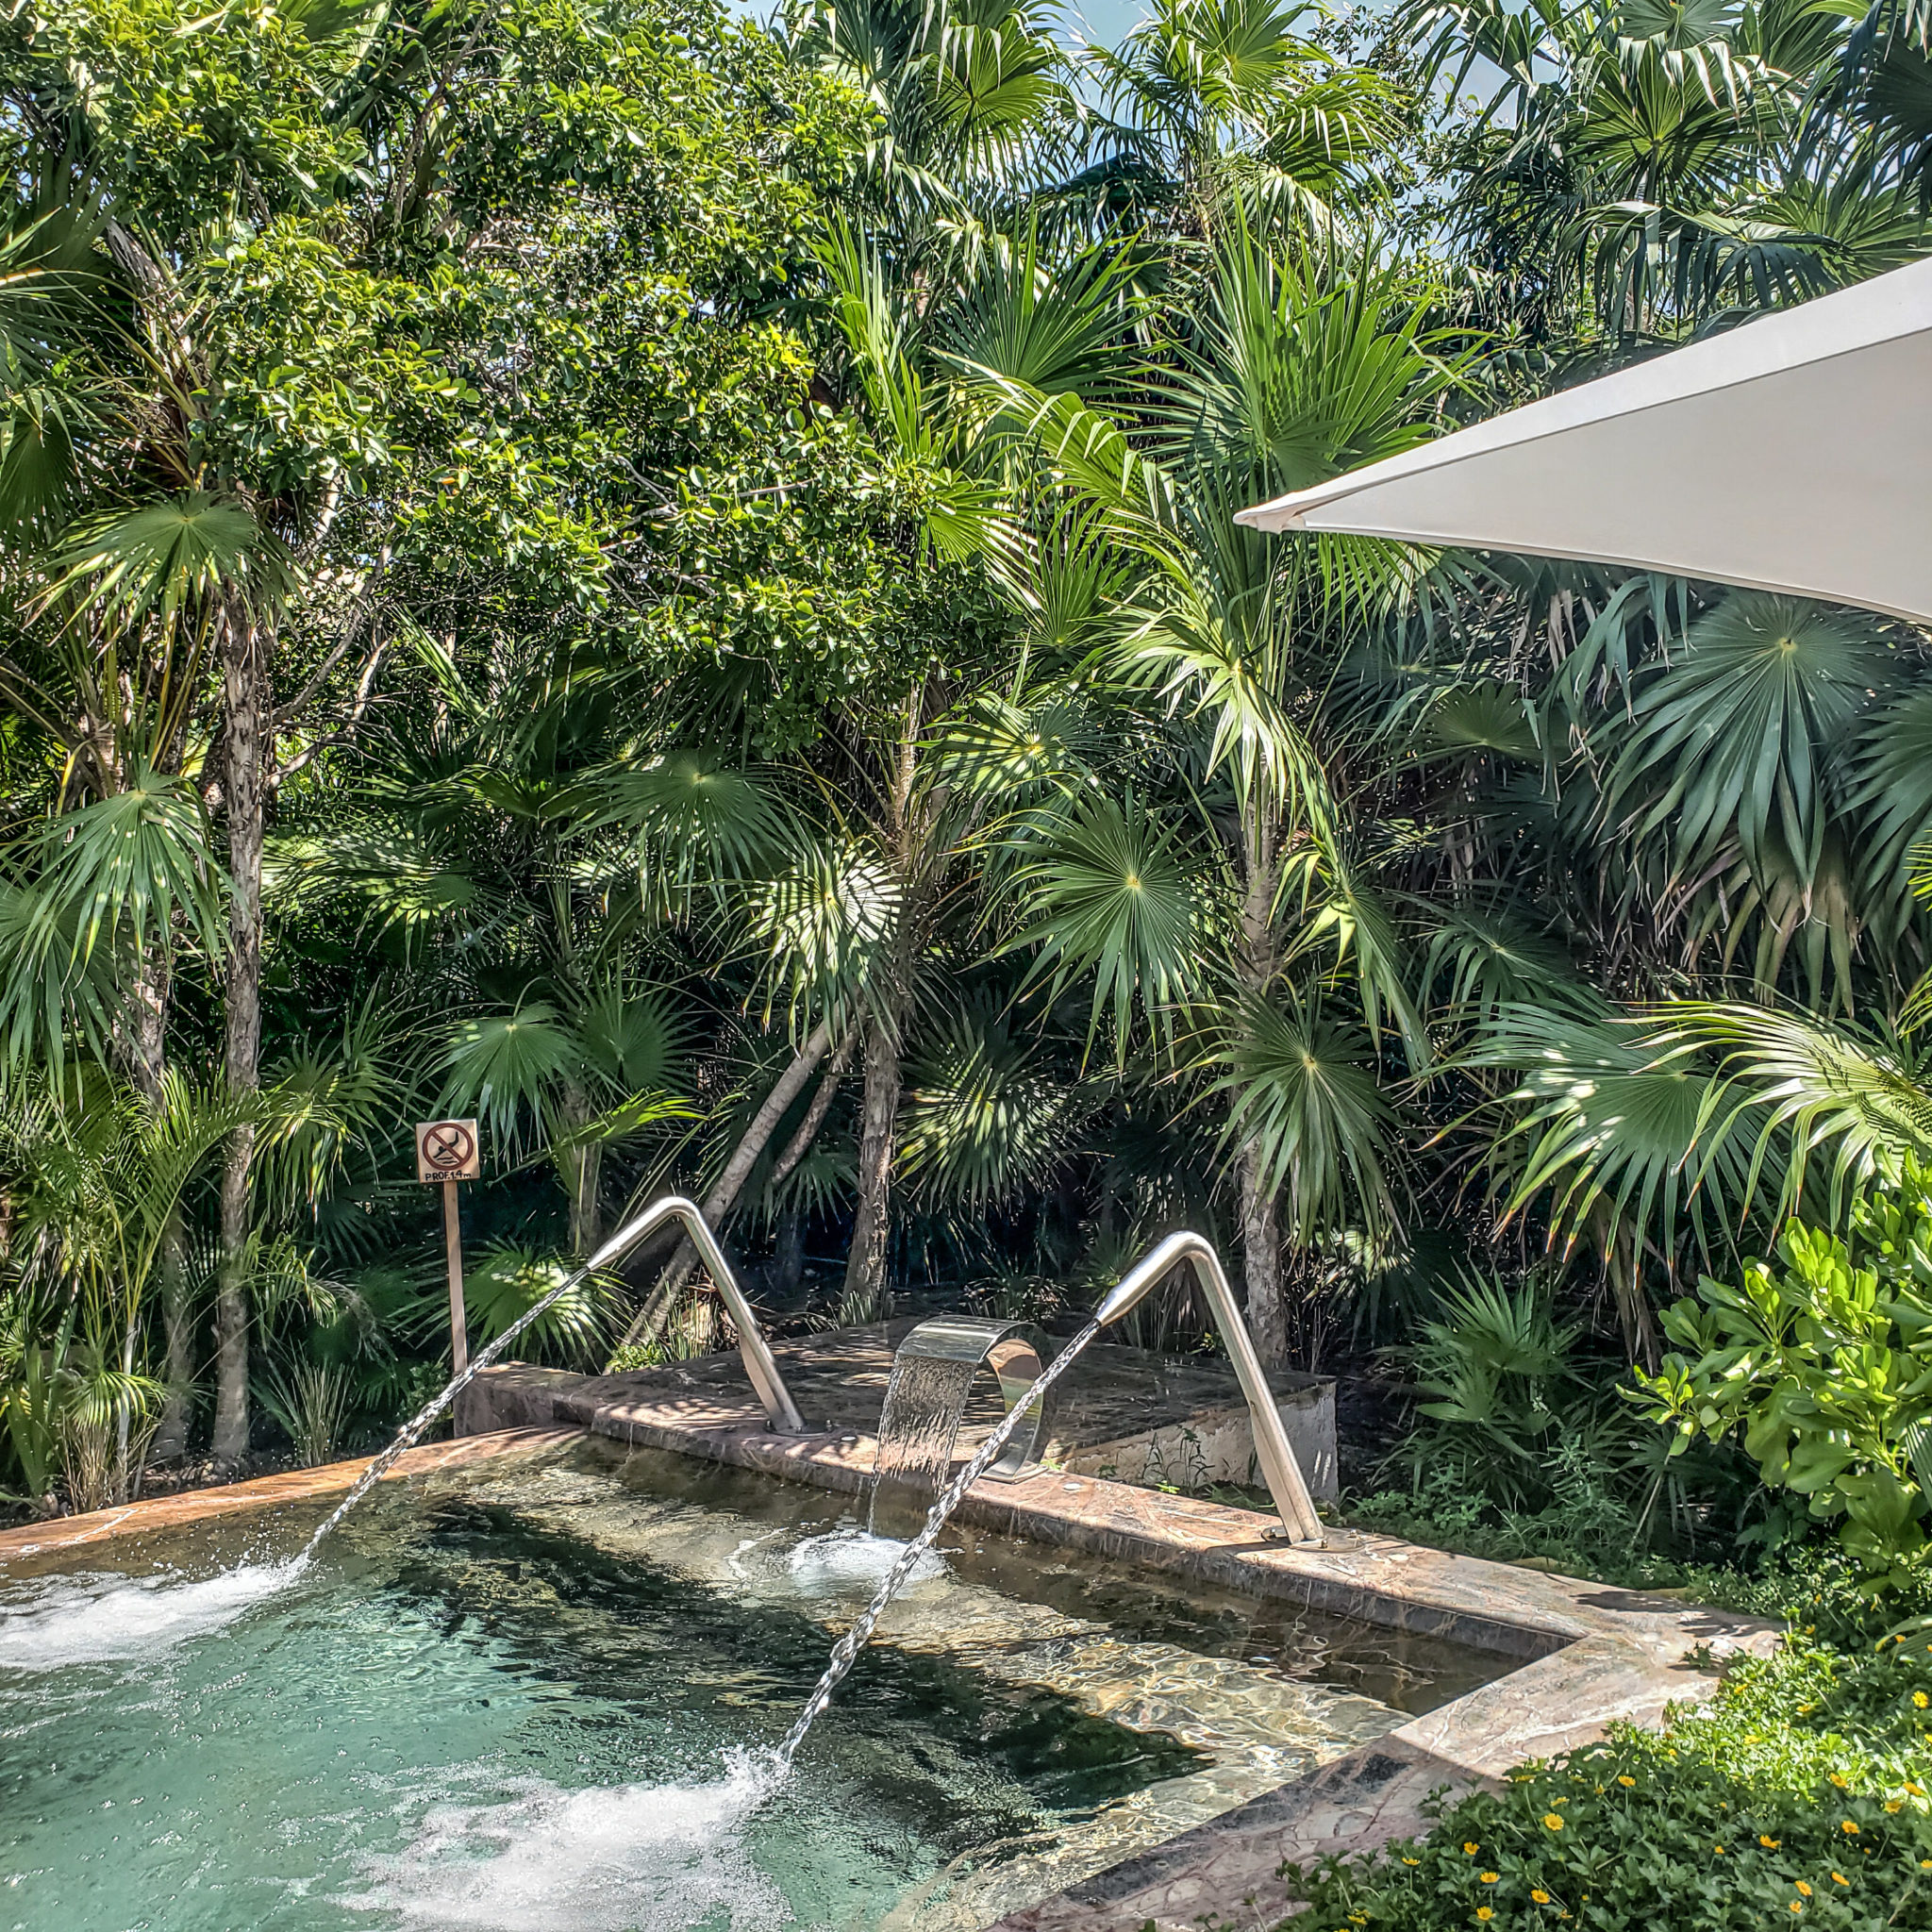 Chable Maroma Resort - Quintana Roo - Playa Del Carmen - Playa Maroma - Cocktail Class - Spa